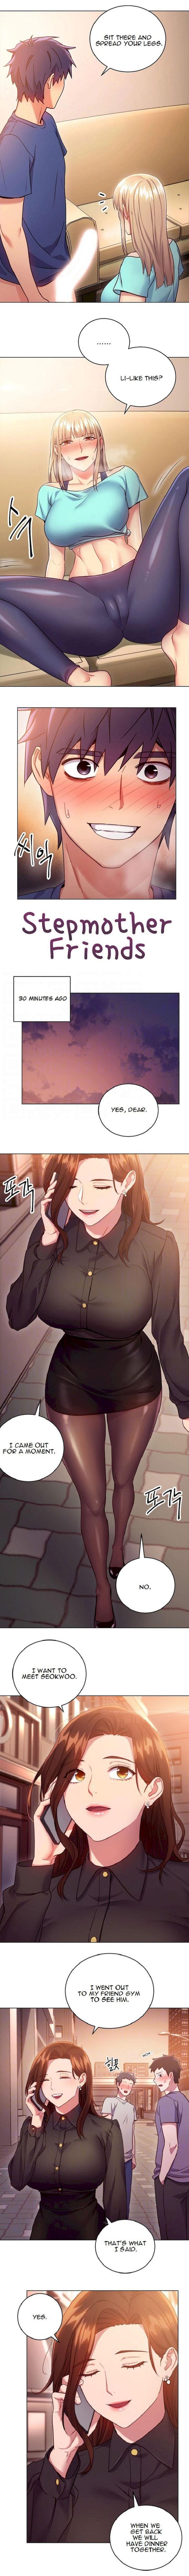 [Neck Pilllow] Stepmother Friends Ch.39/? [English] [Hentai Universe] NEW! 13/10/2020 169